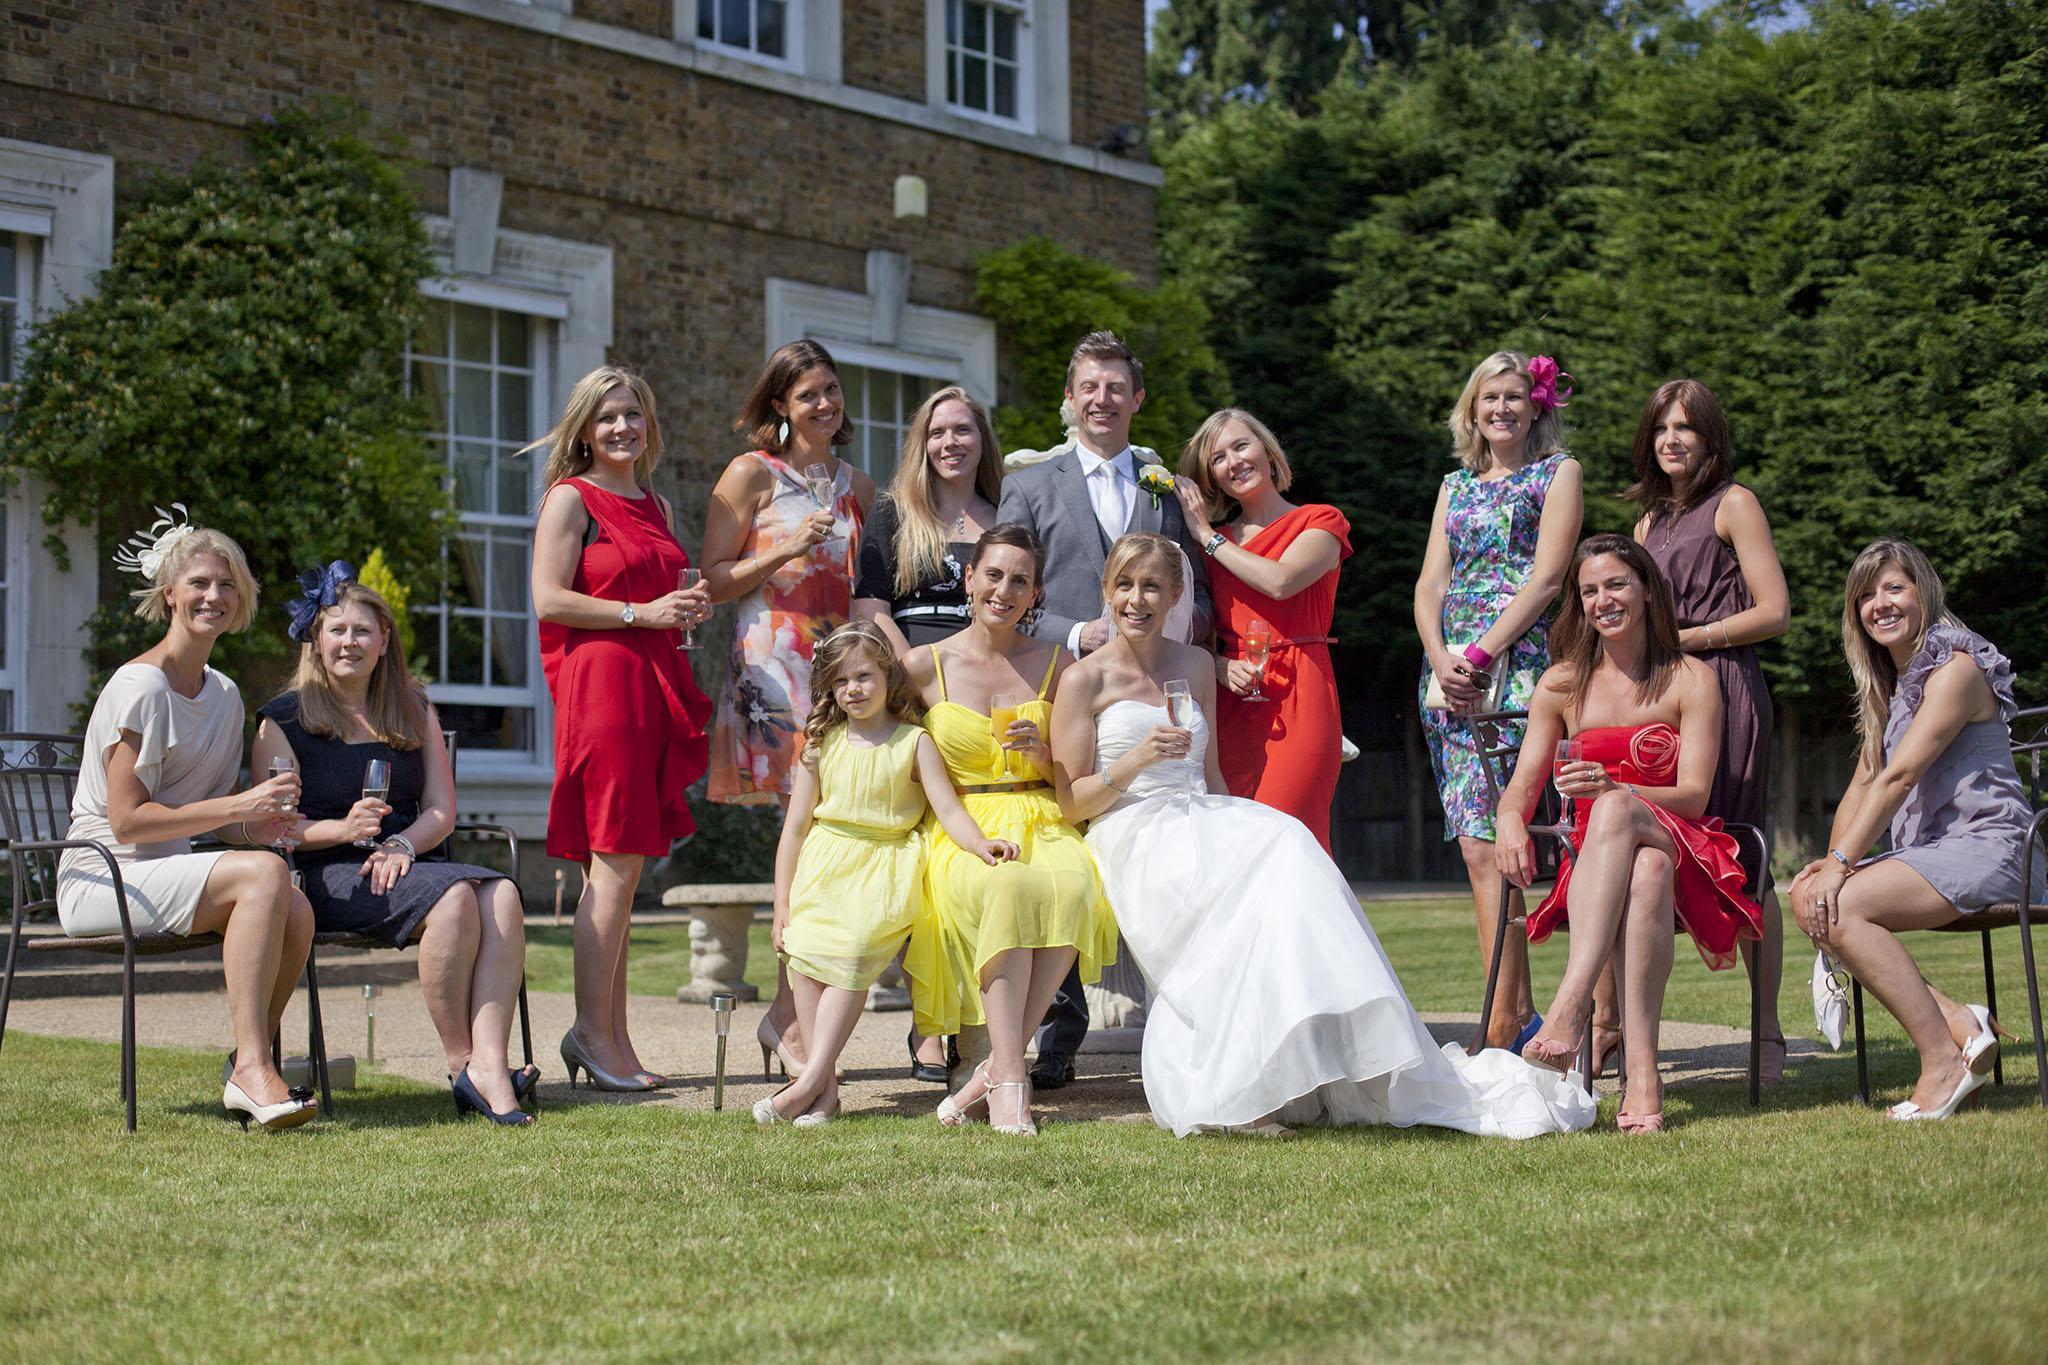 elizabethg_fineart_photography_hertfordshire_rachel_adam_wedding_highelmsmanor_39.jpg